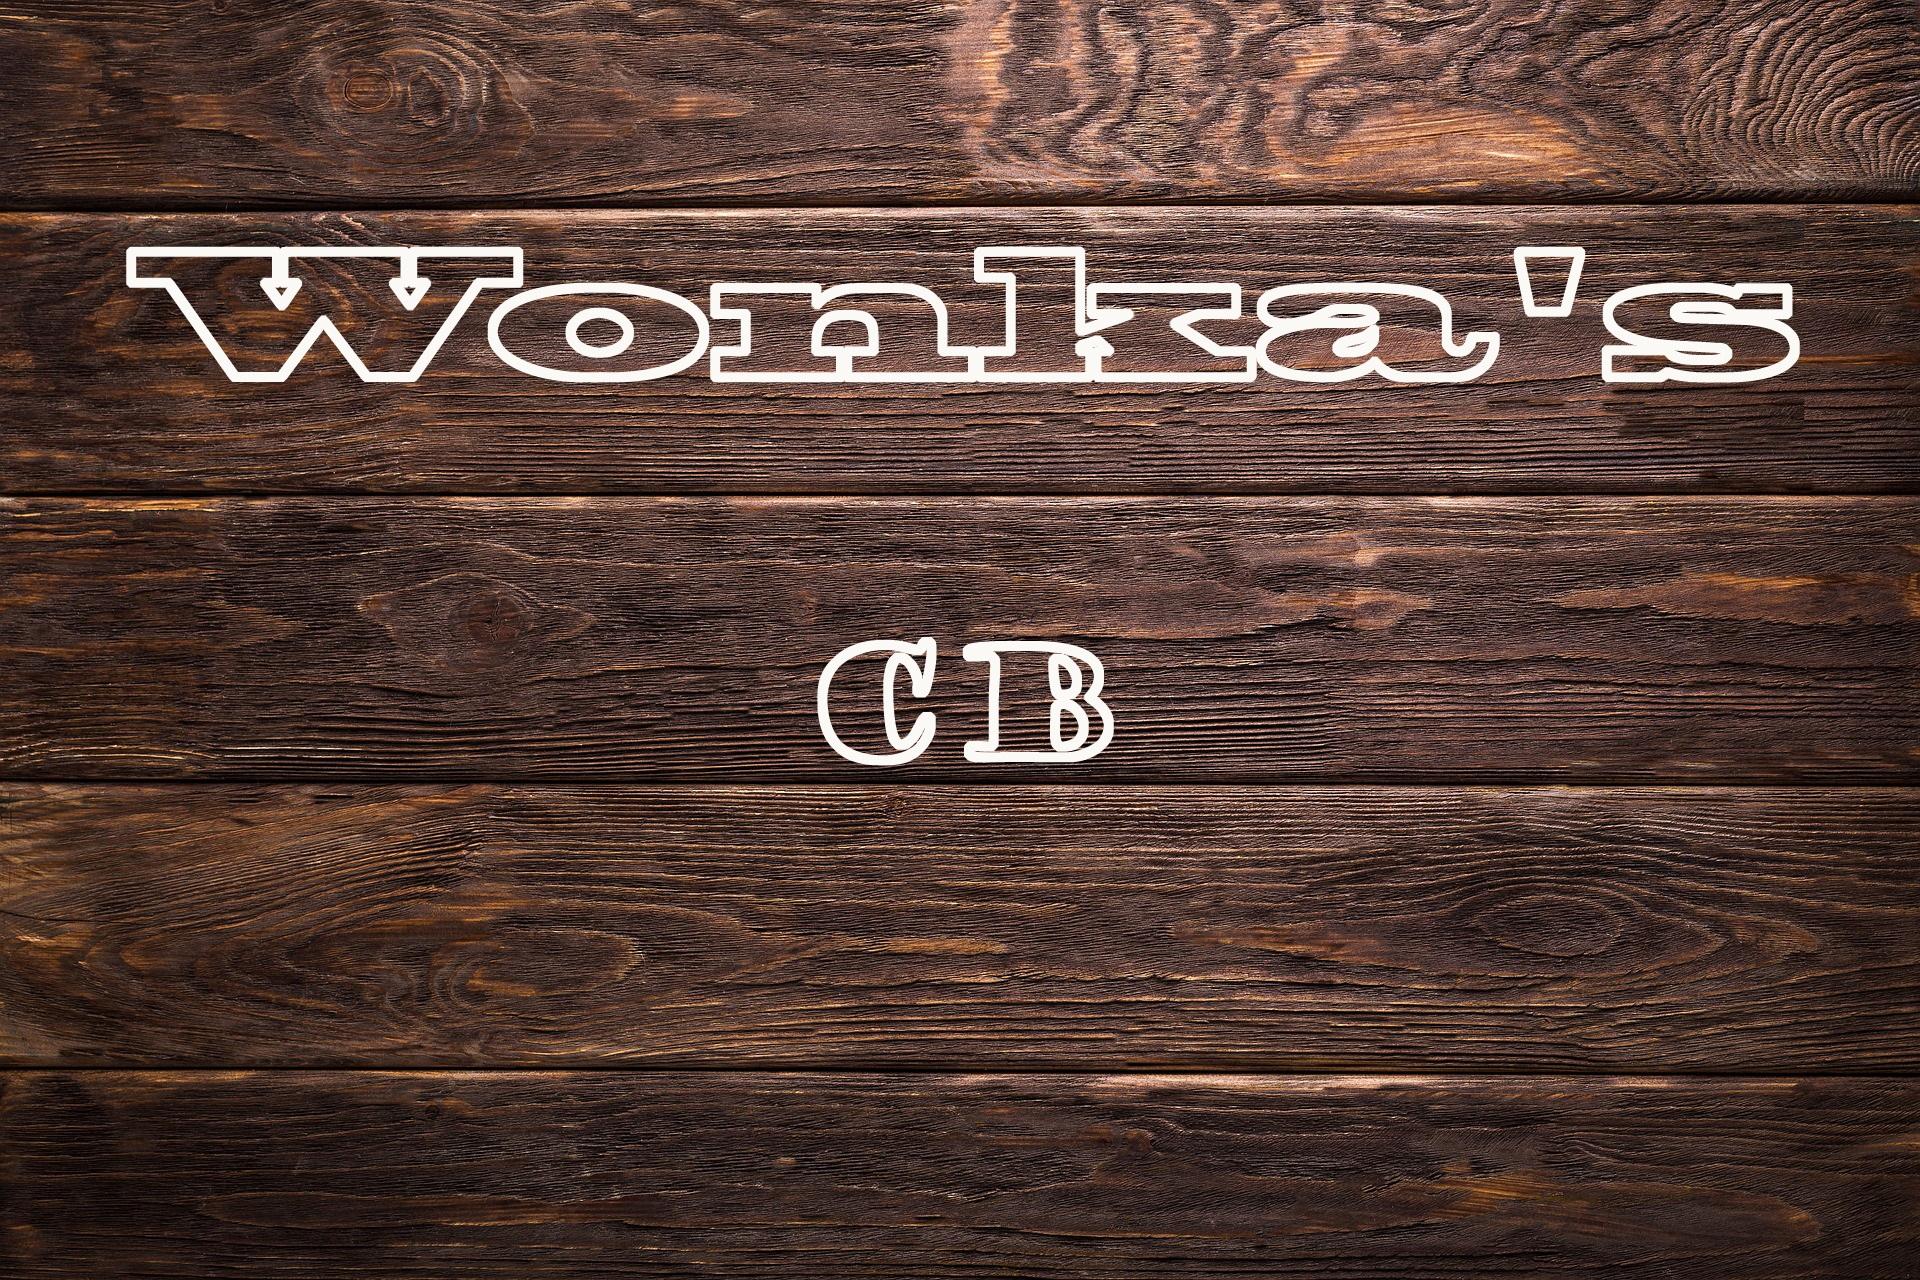 Разработка логотипа магазина сладостей со всего мира. фото f_0095a298a028b136.jpg